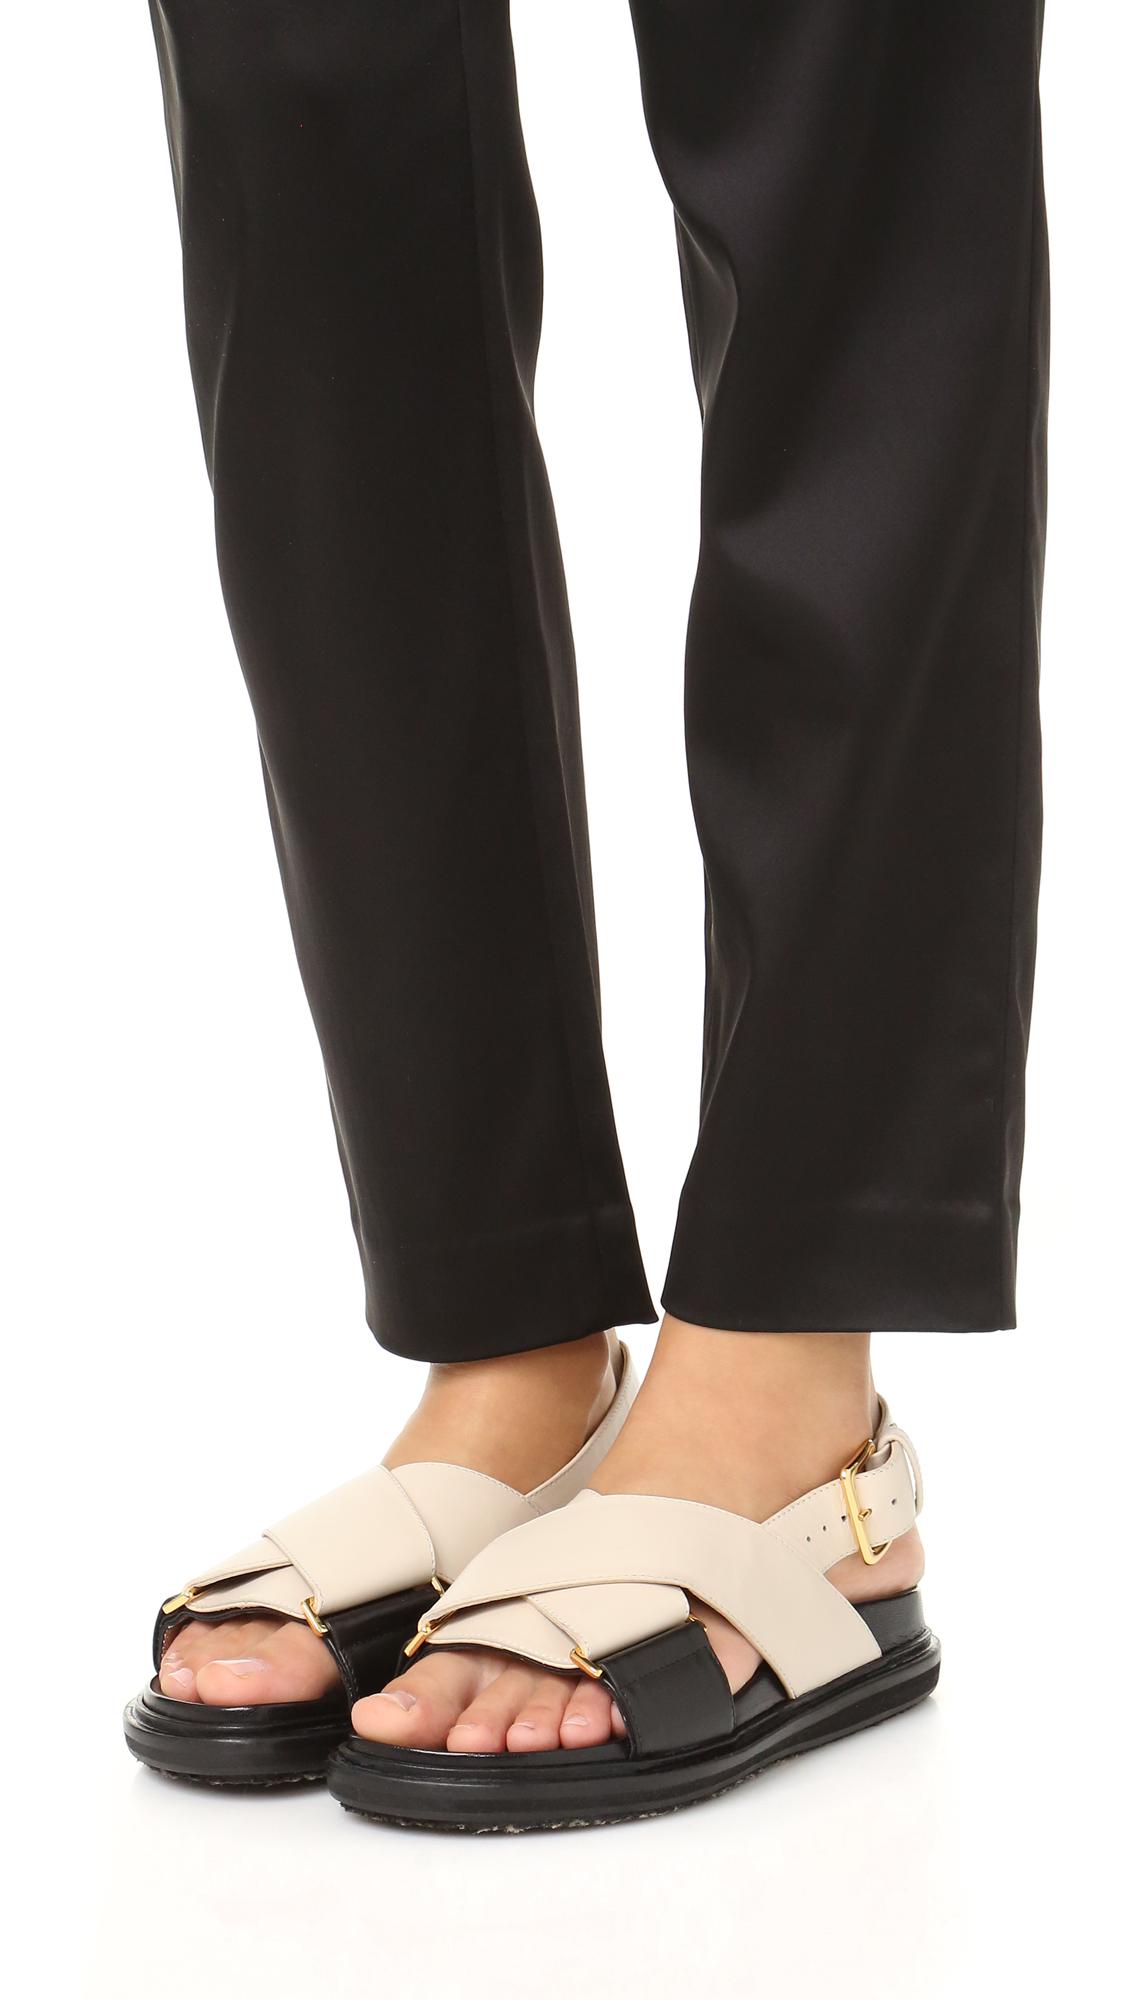 Marni Fussbett sandals 9RIw0eoWWW